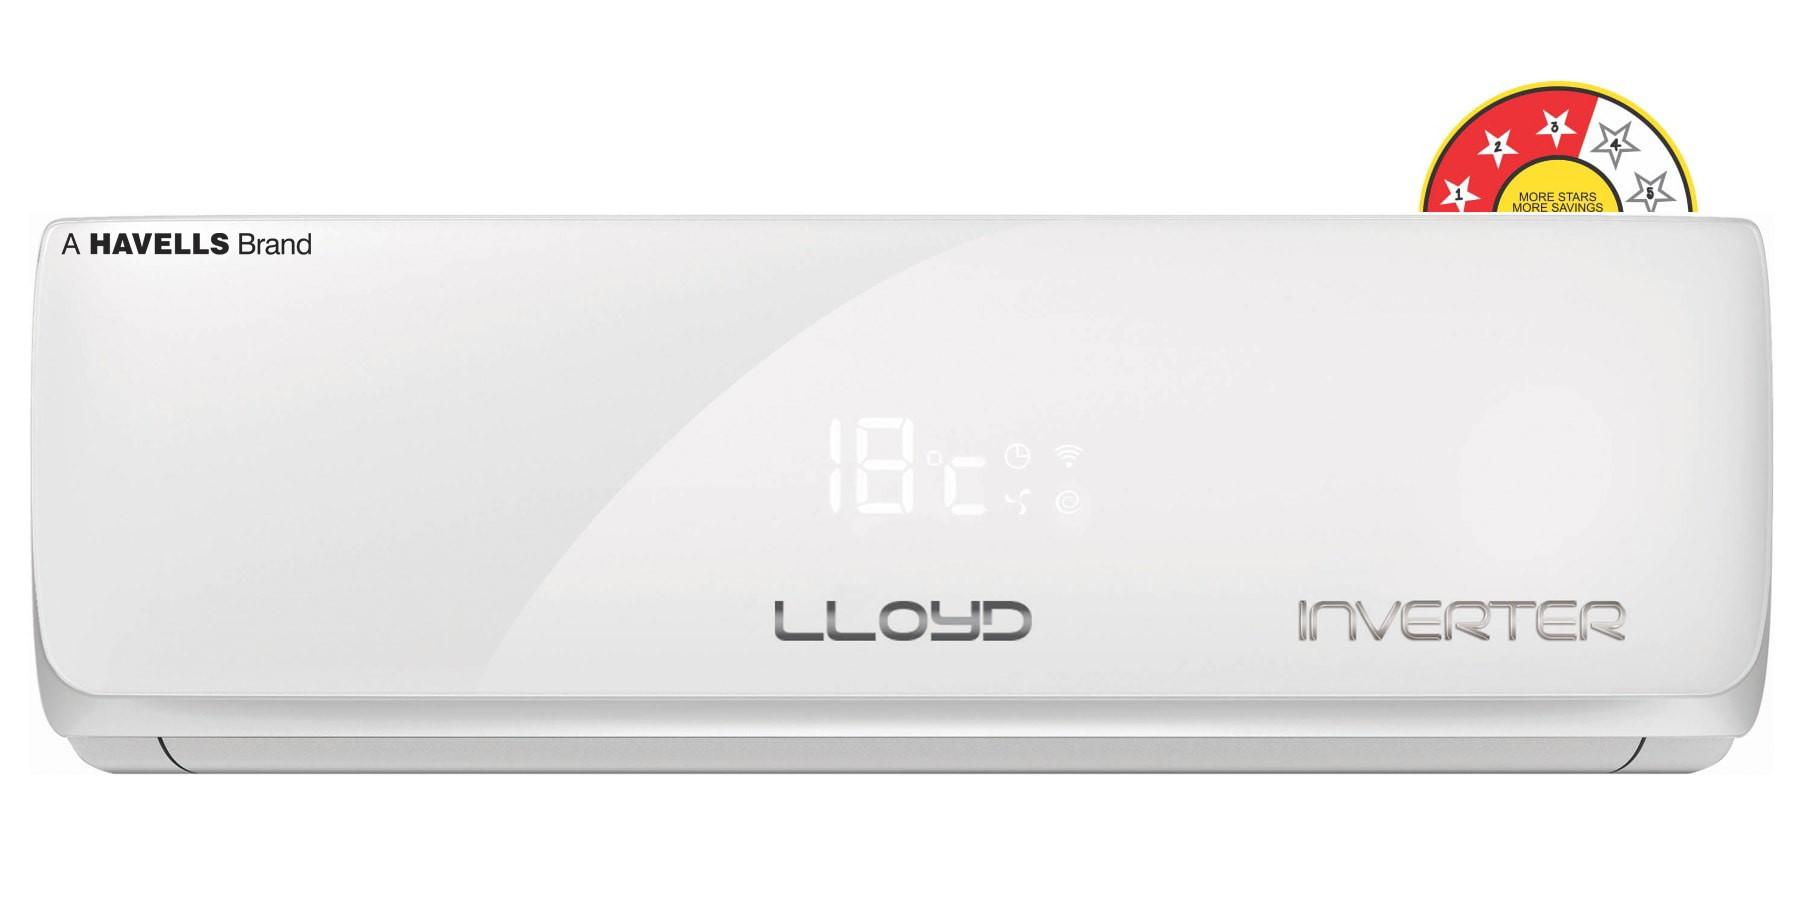 Buy Lloyd 1.5 Ton Split Inverter Air Conditioner Online - LS18I31BA